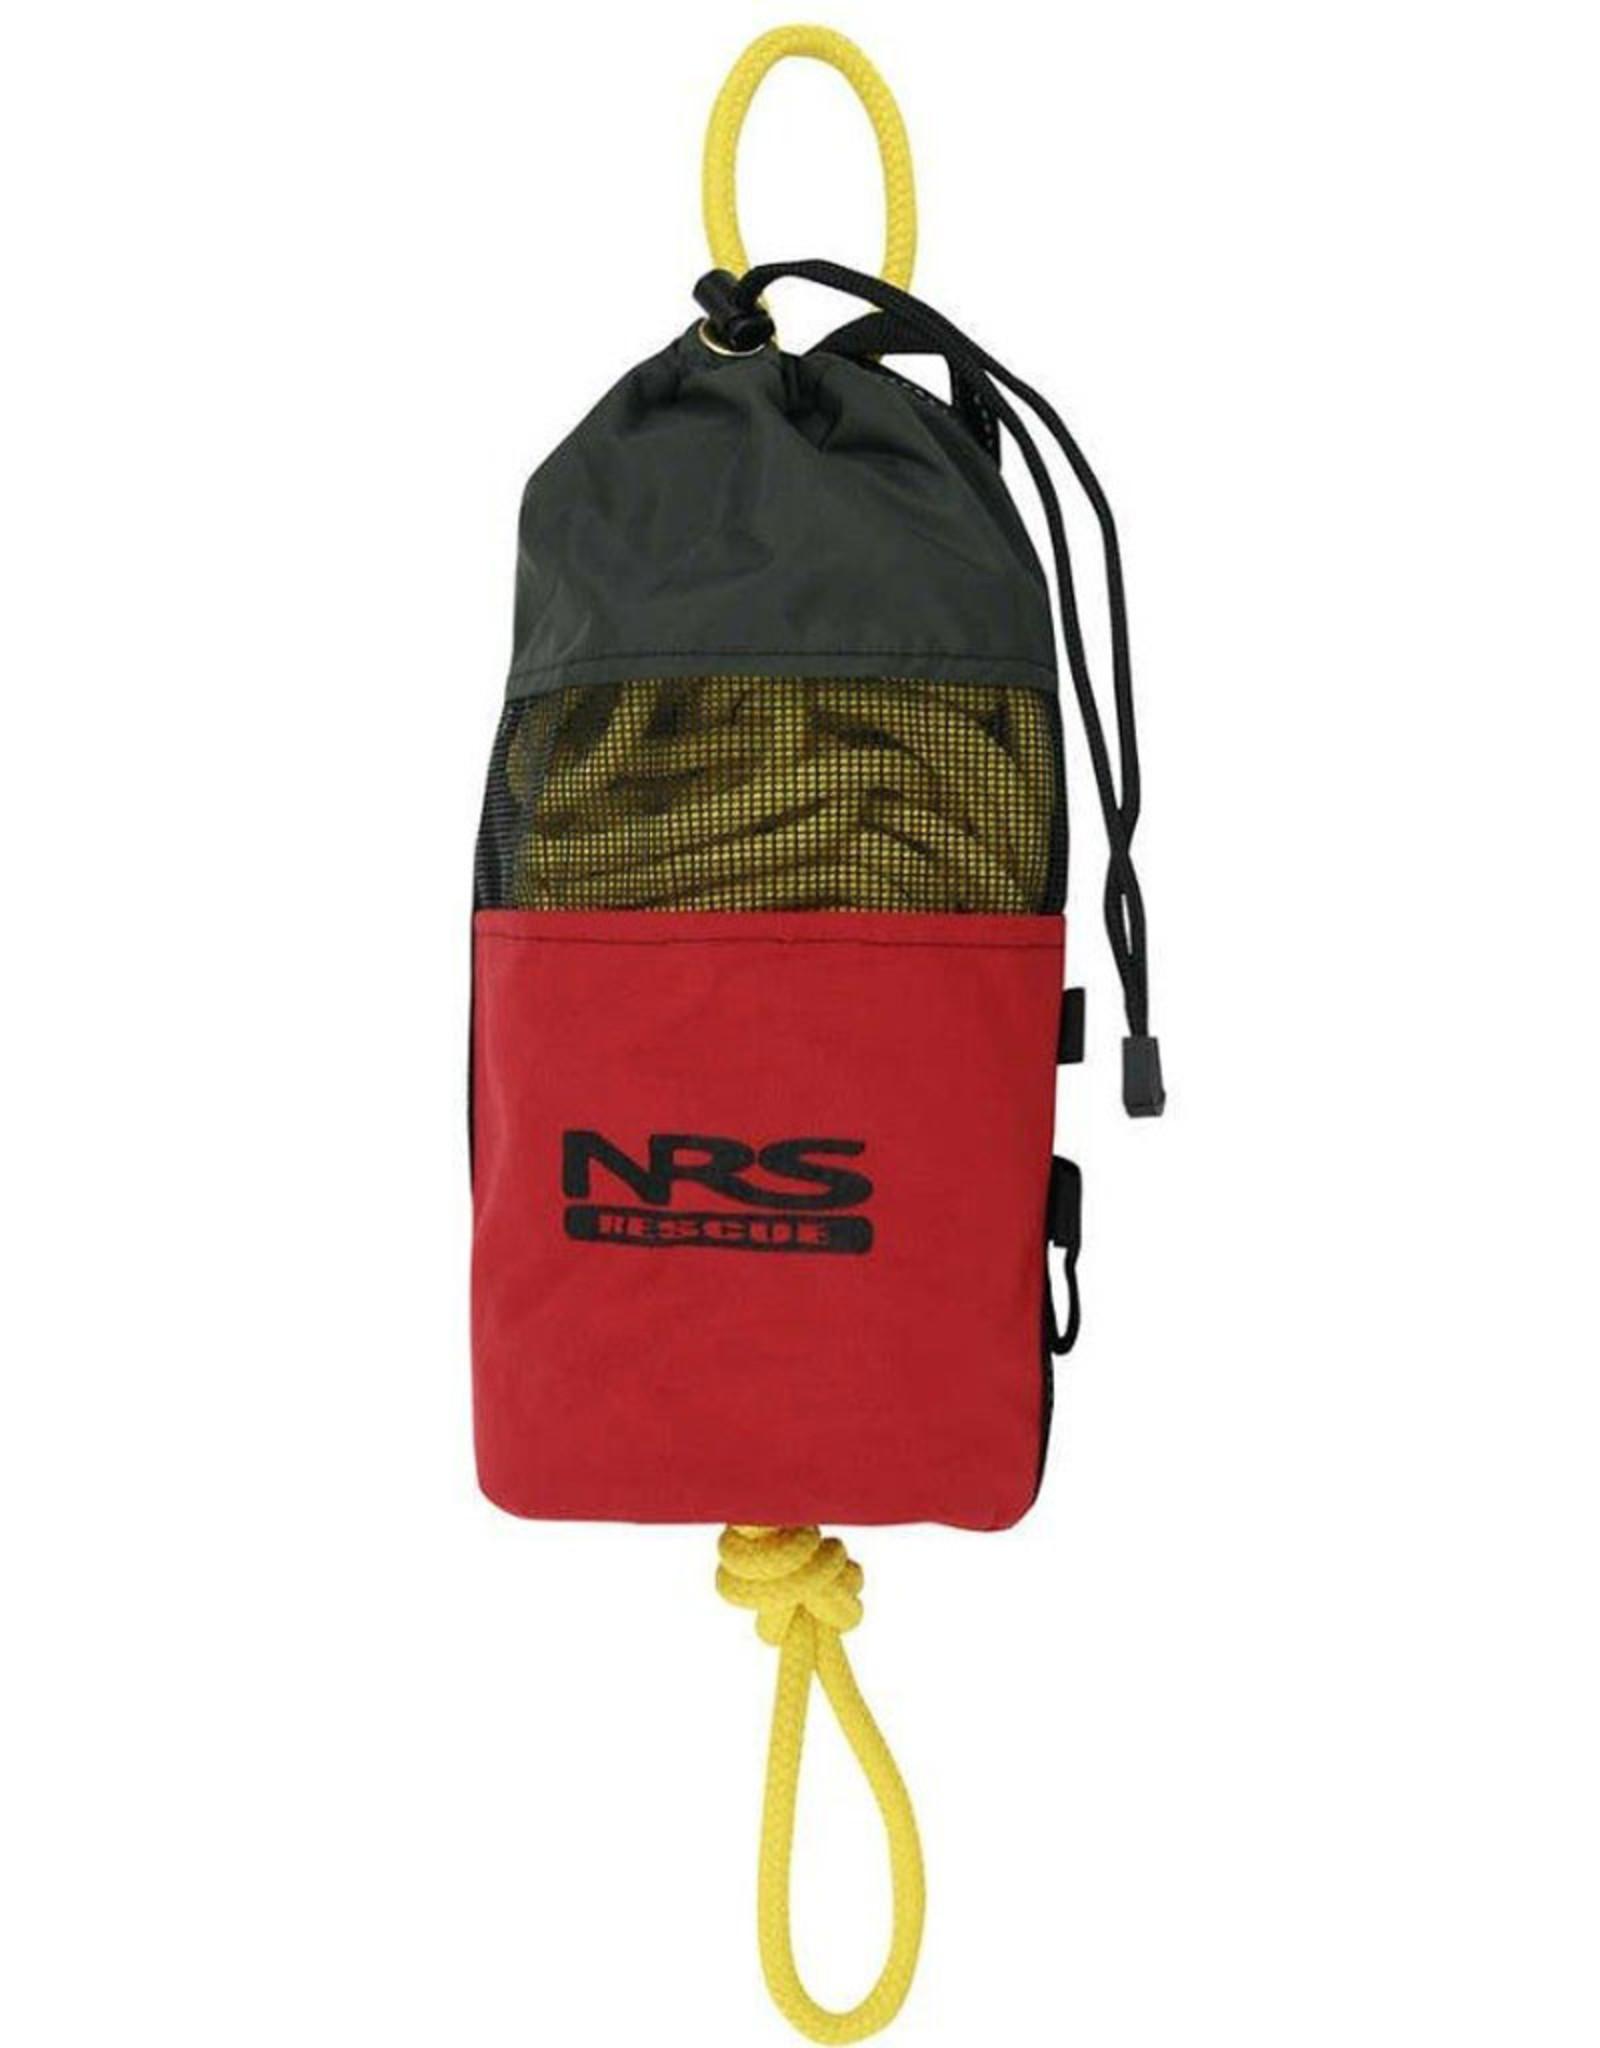 NRS NRS Standard Rescue Bag